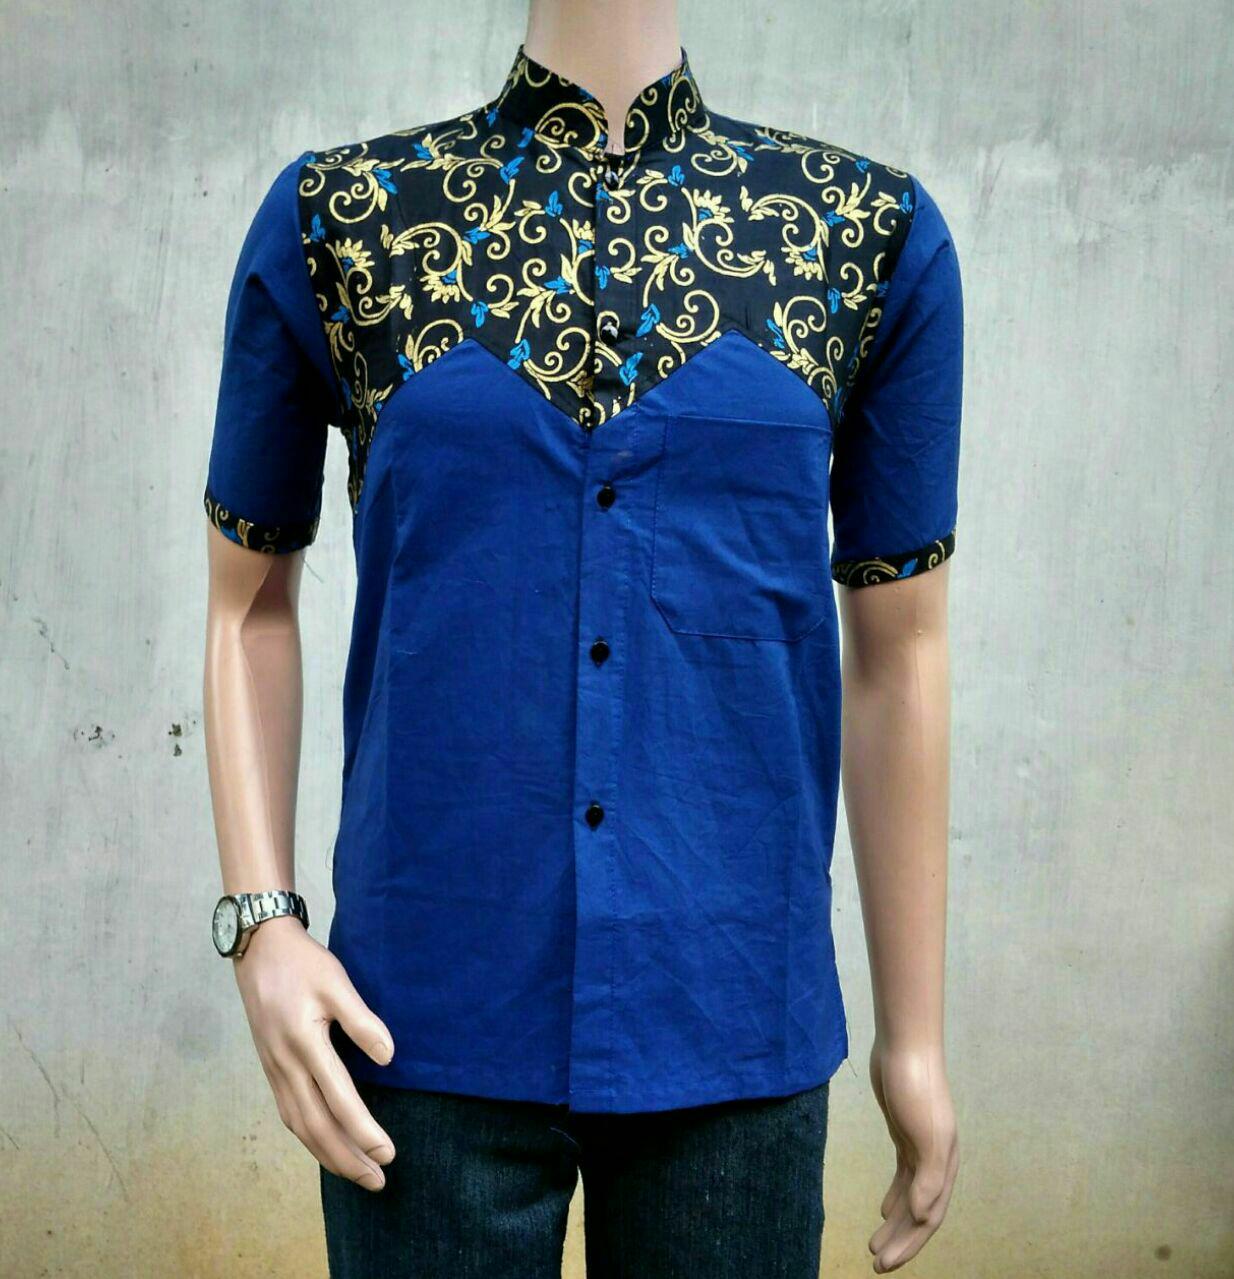 Top Desain Baju Batik Cowok Keren   1001desainer